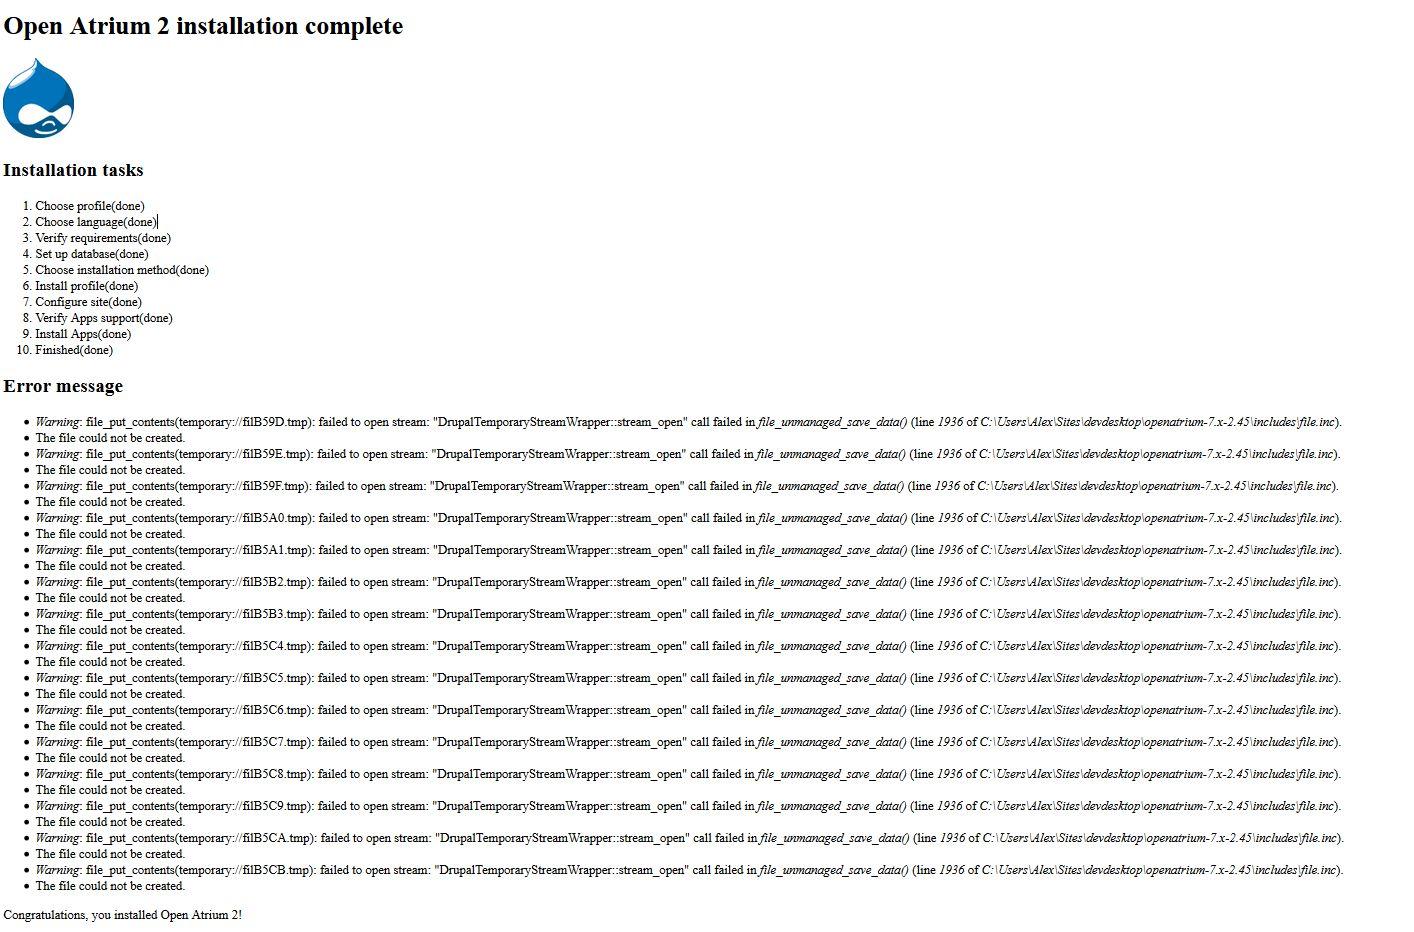 Error when installing Open Atrium 2 using DAMP/WAMP [#2573871